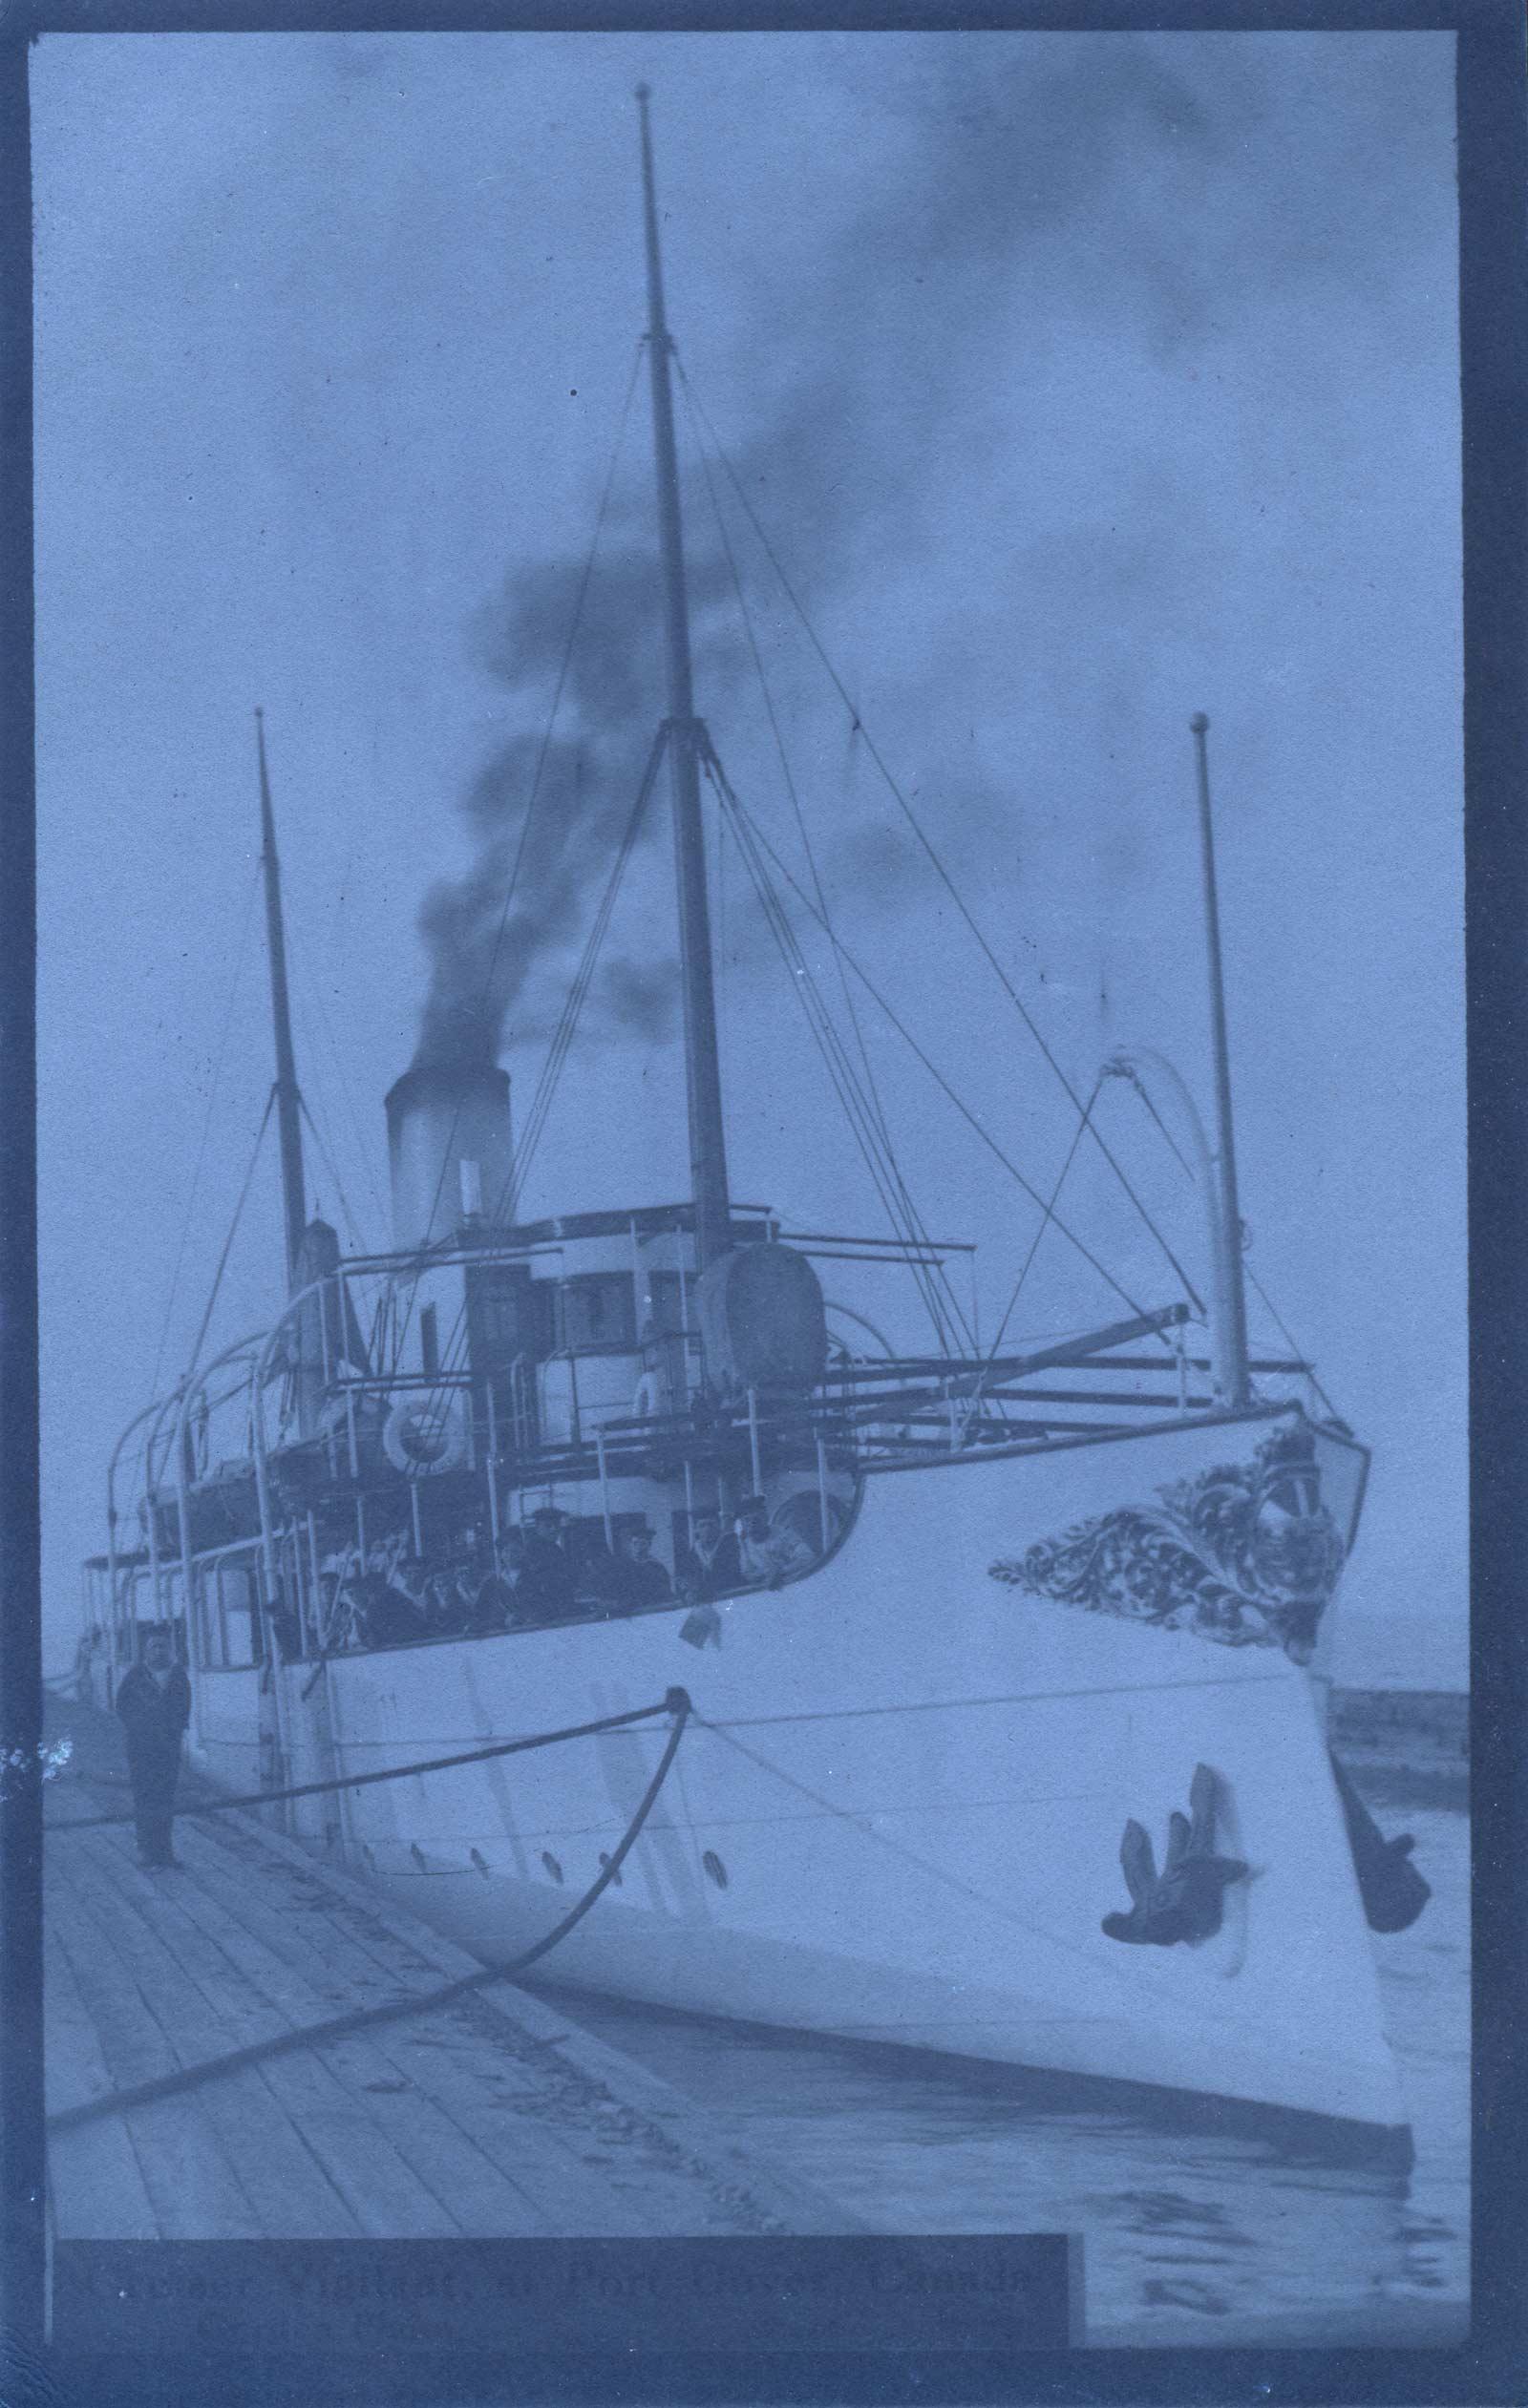 Steamer VIGILANT at Port Dover, Canada